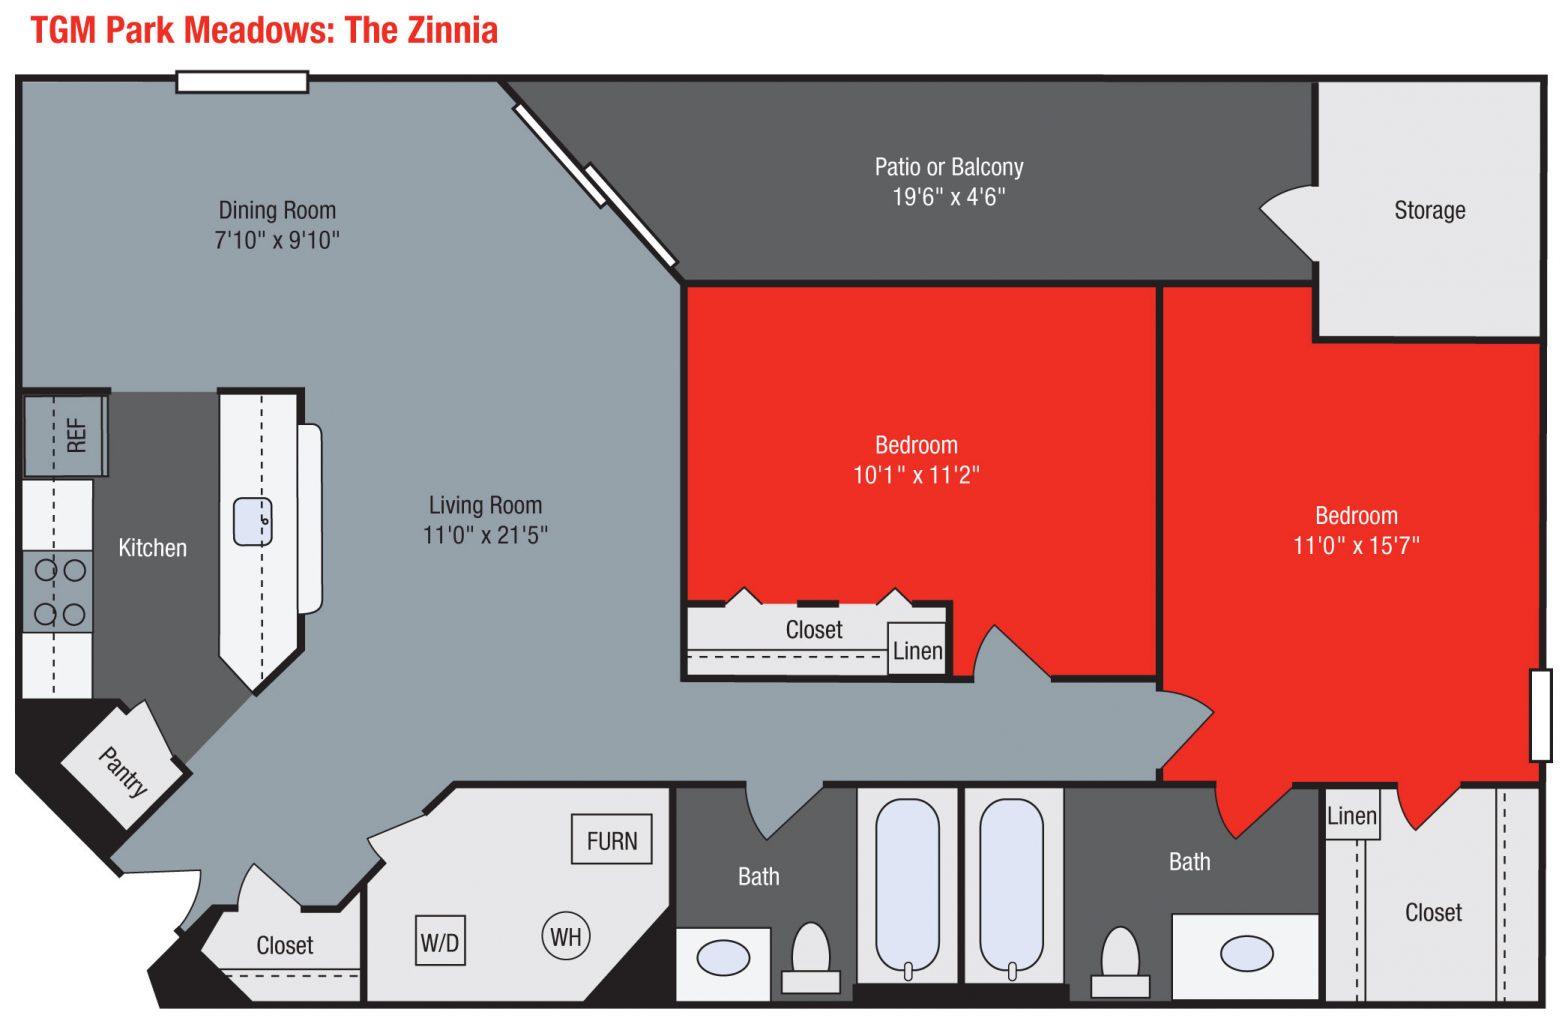 Apartments For Rent TGM Park Meadows - Zinnia